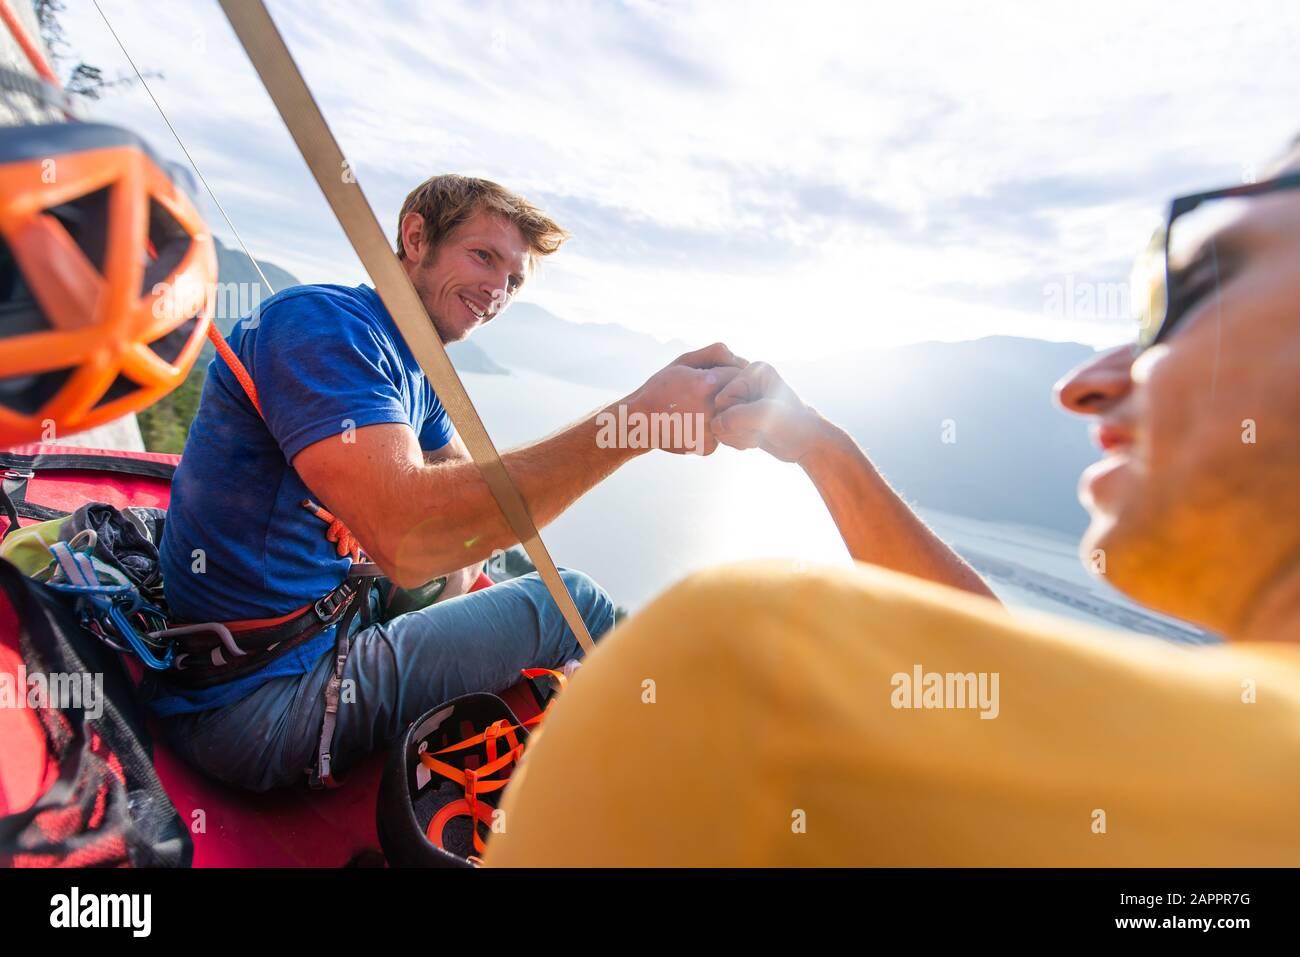 Big wall climbing with portaledge, Squamish, British Columbia, Canada Stock Photo